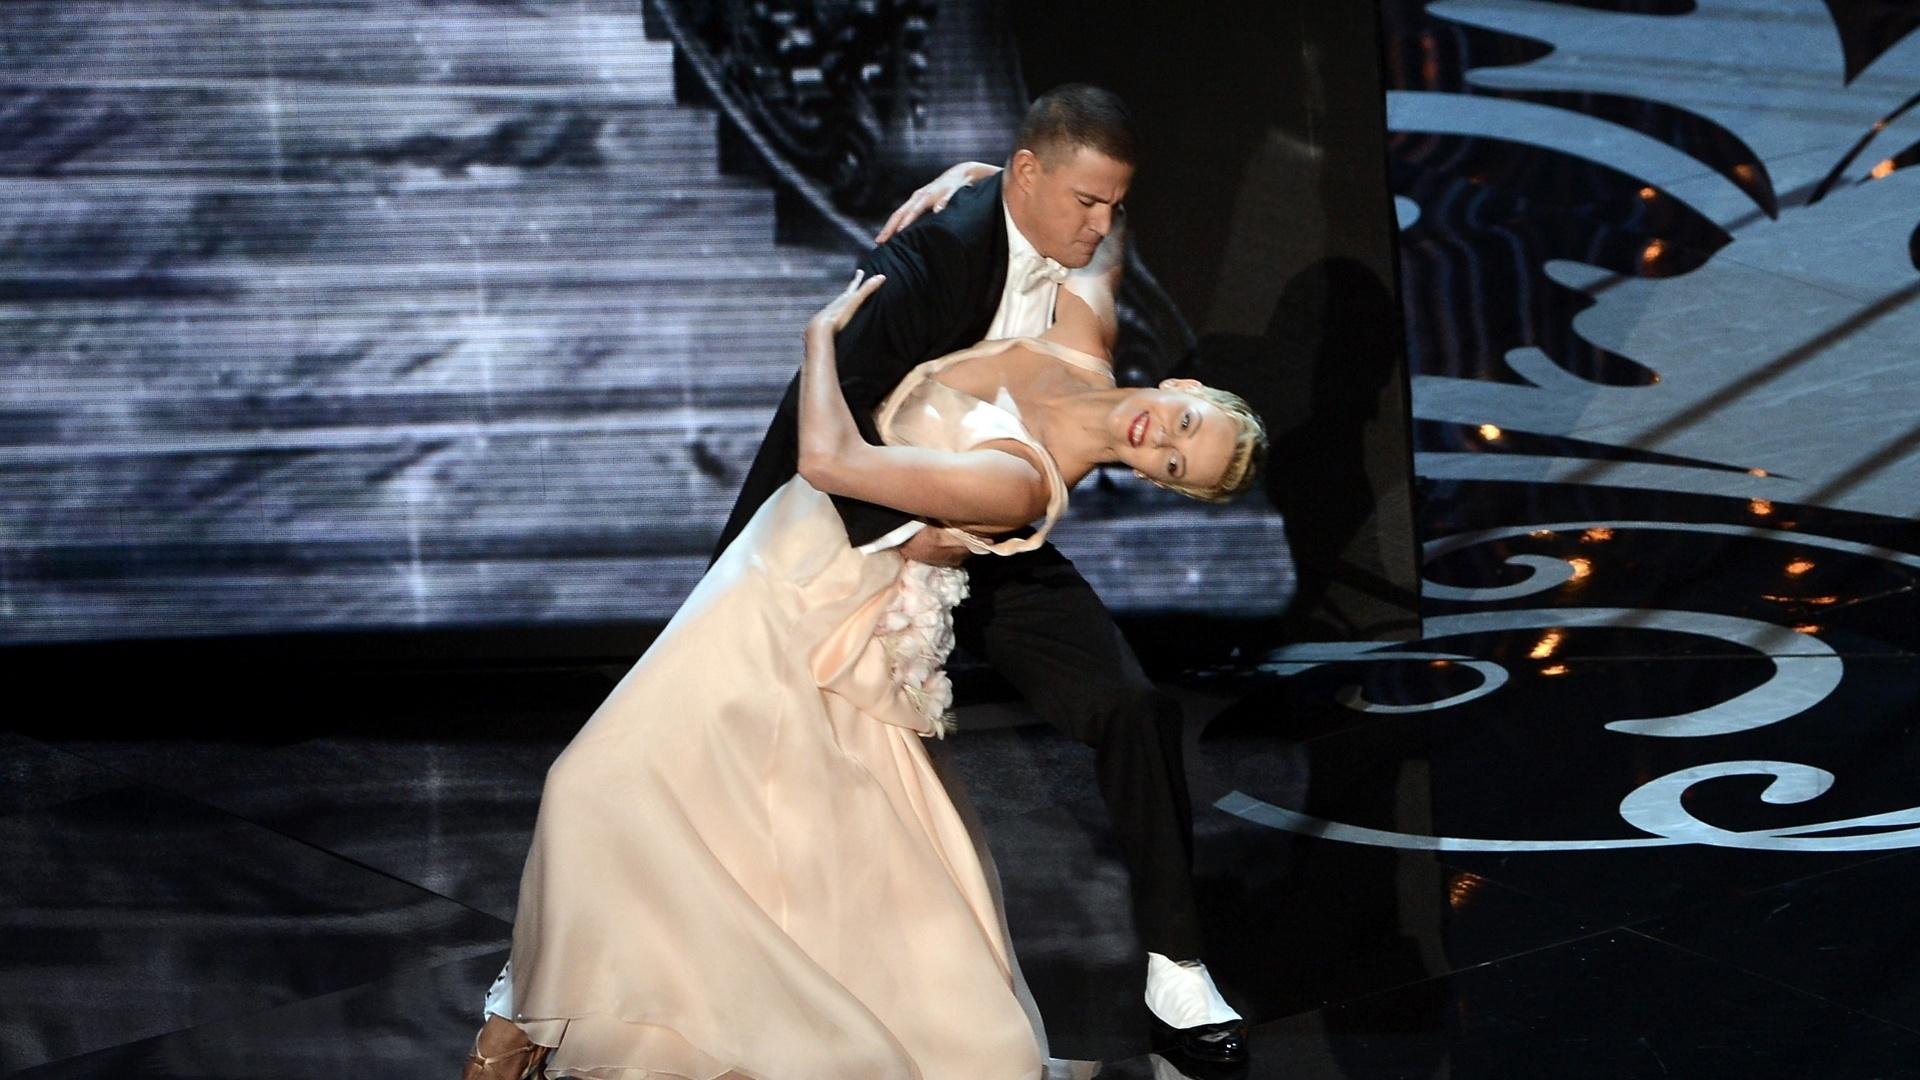 24.fev.2013 - Channing Tatum e Charlize Theron dançam na abertura do Oscar 2013